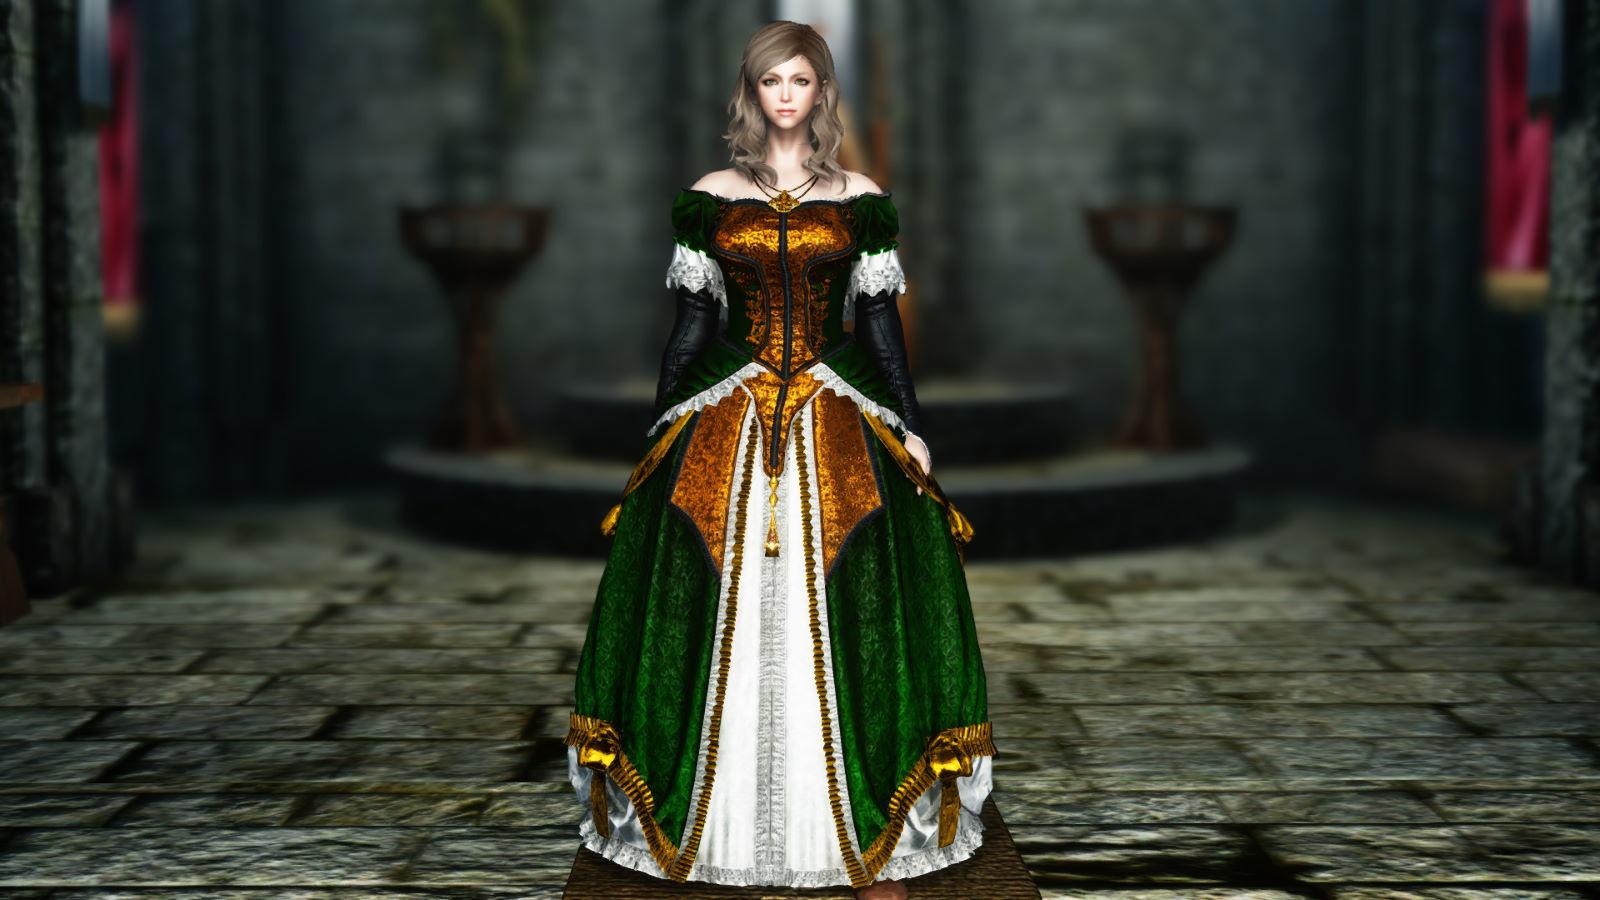 FullInuEliseDressSK 240-1 Pose Dress Green 1